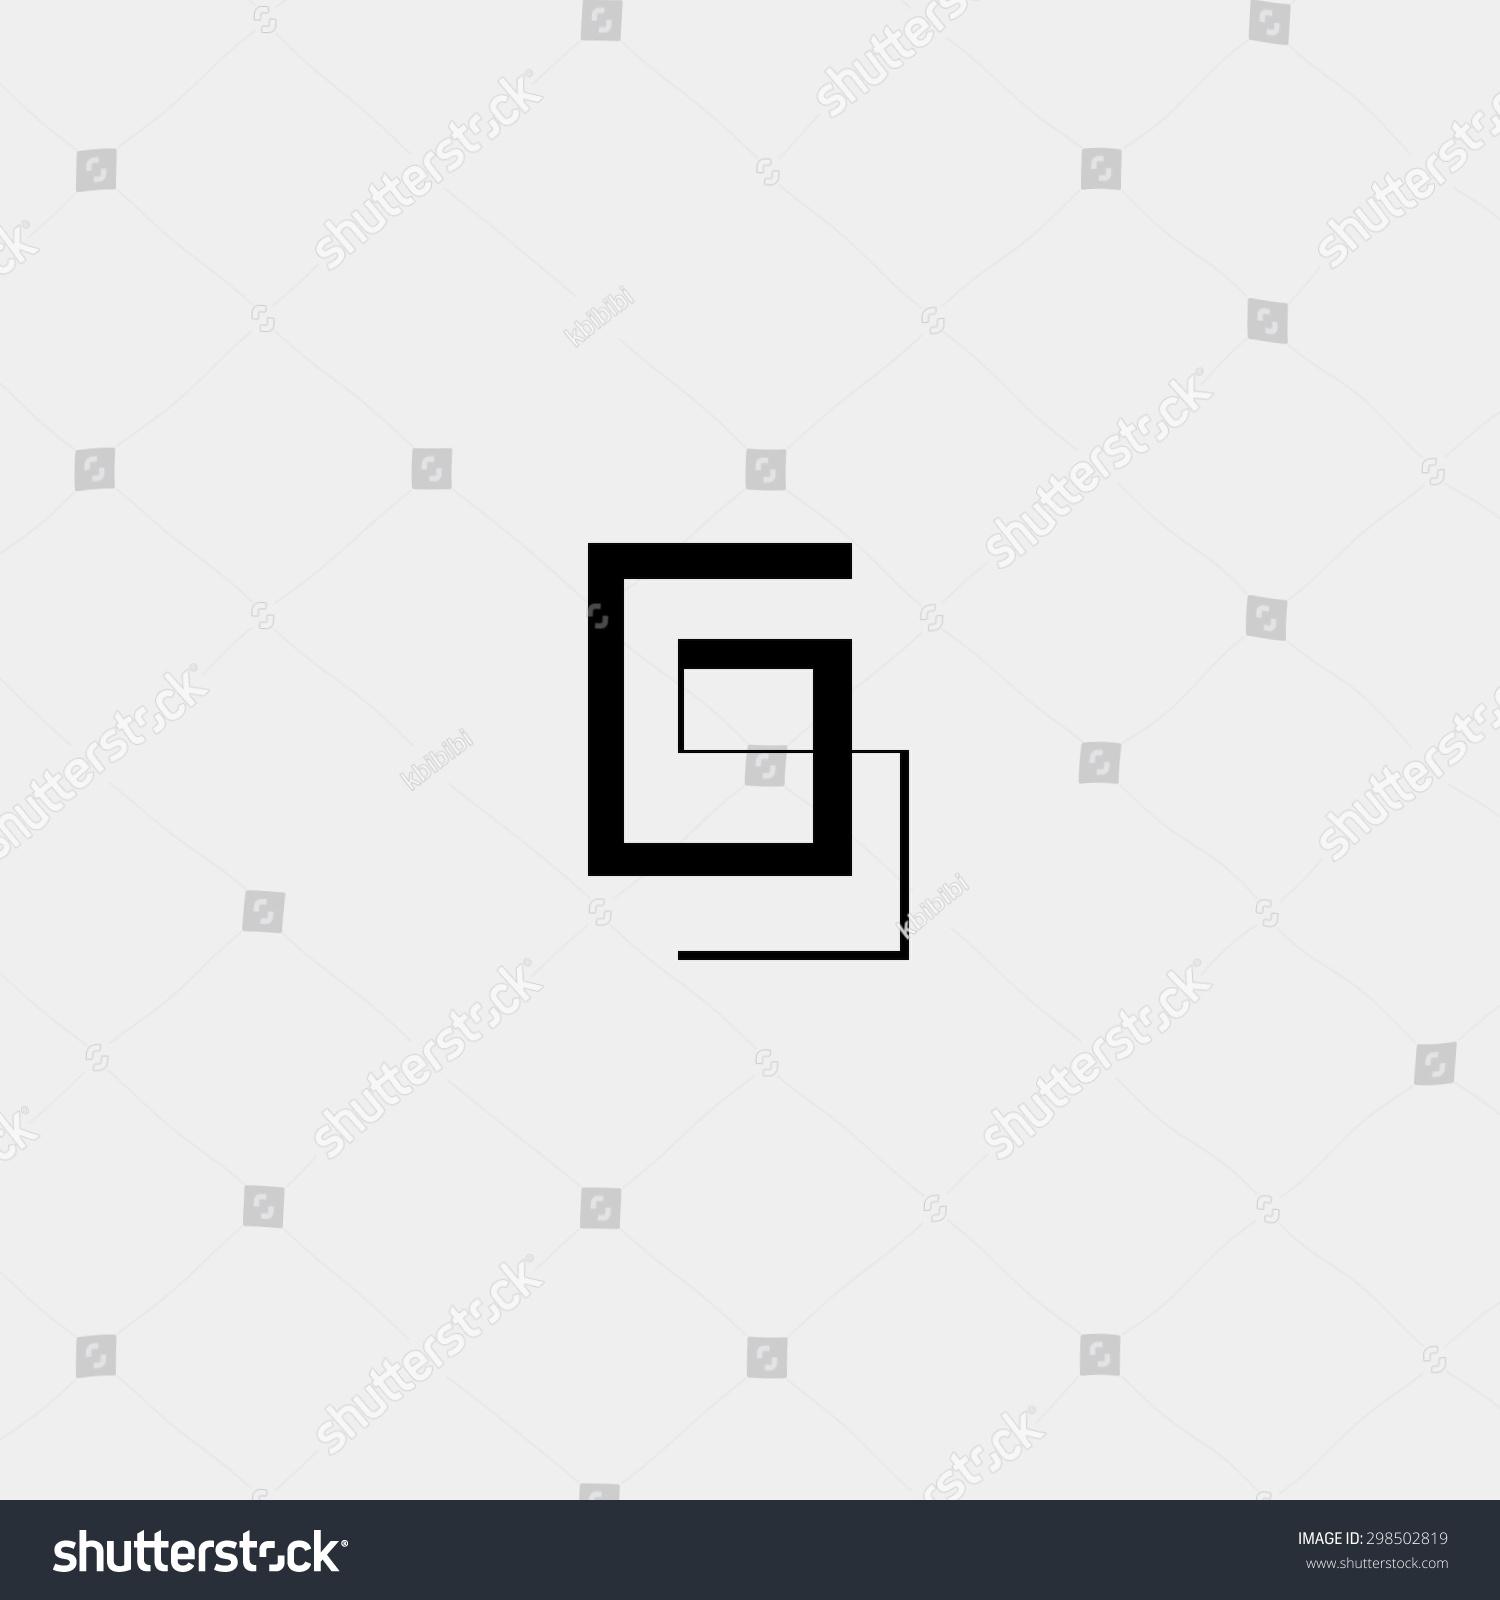 Letter g icon logo design template stock vector royalty free letter g icon or logo design template elements vector vector black and white minimalistic geometric maxwellsz